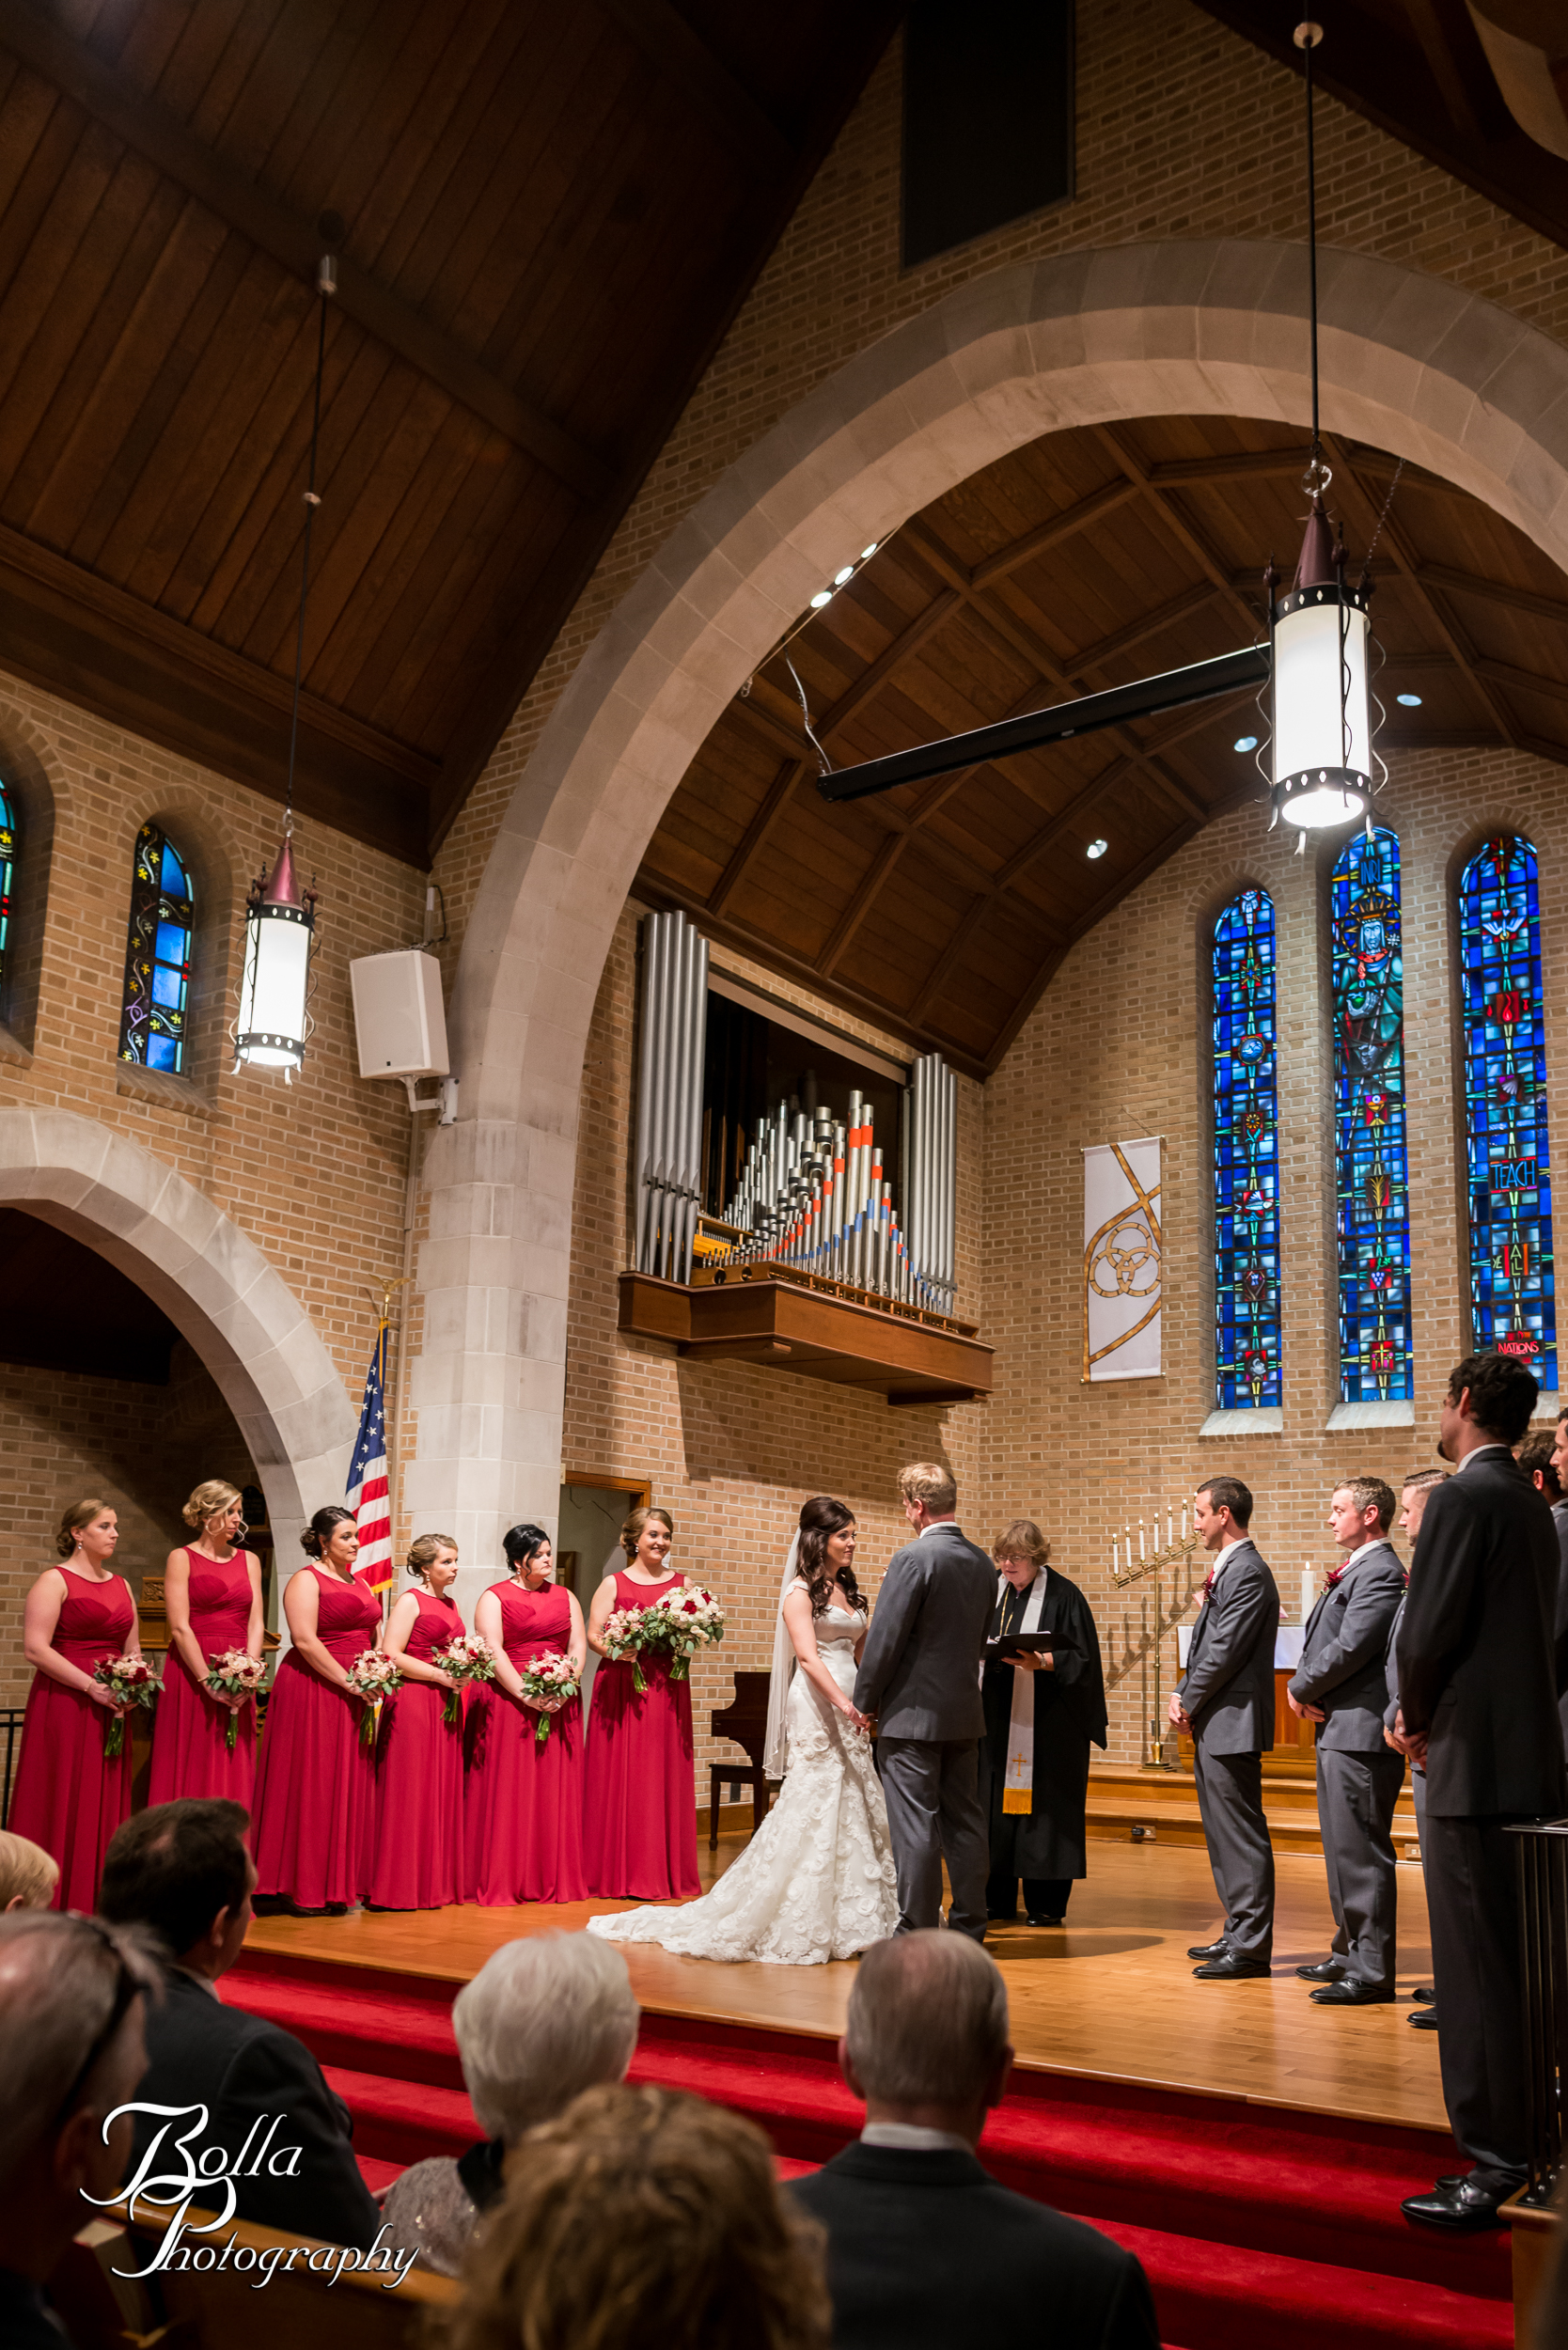 Bolla_photography_edwardsville_wedding_photographer_st_louis_weddings_Reilmann-0160.jpg